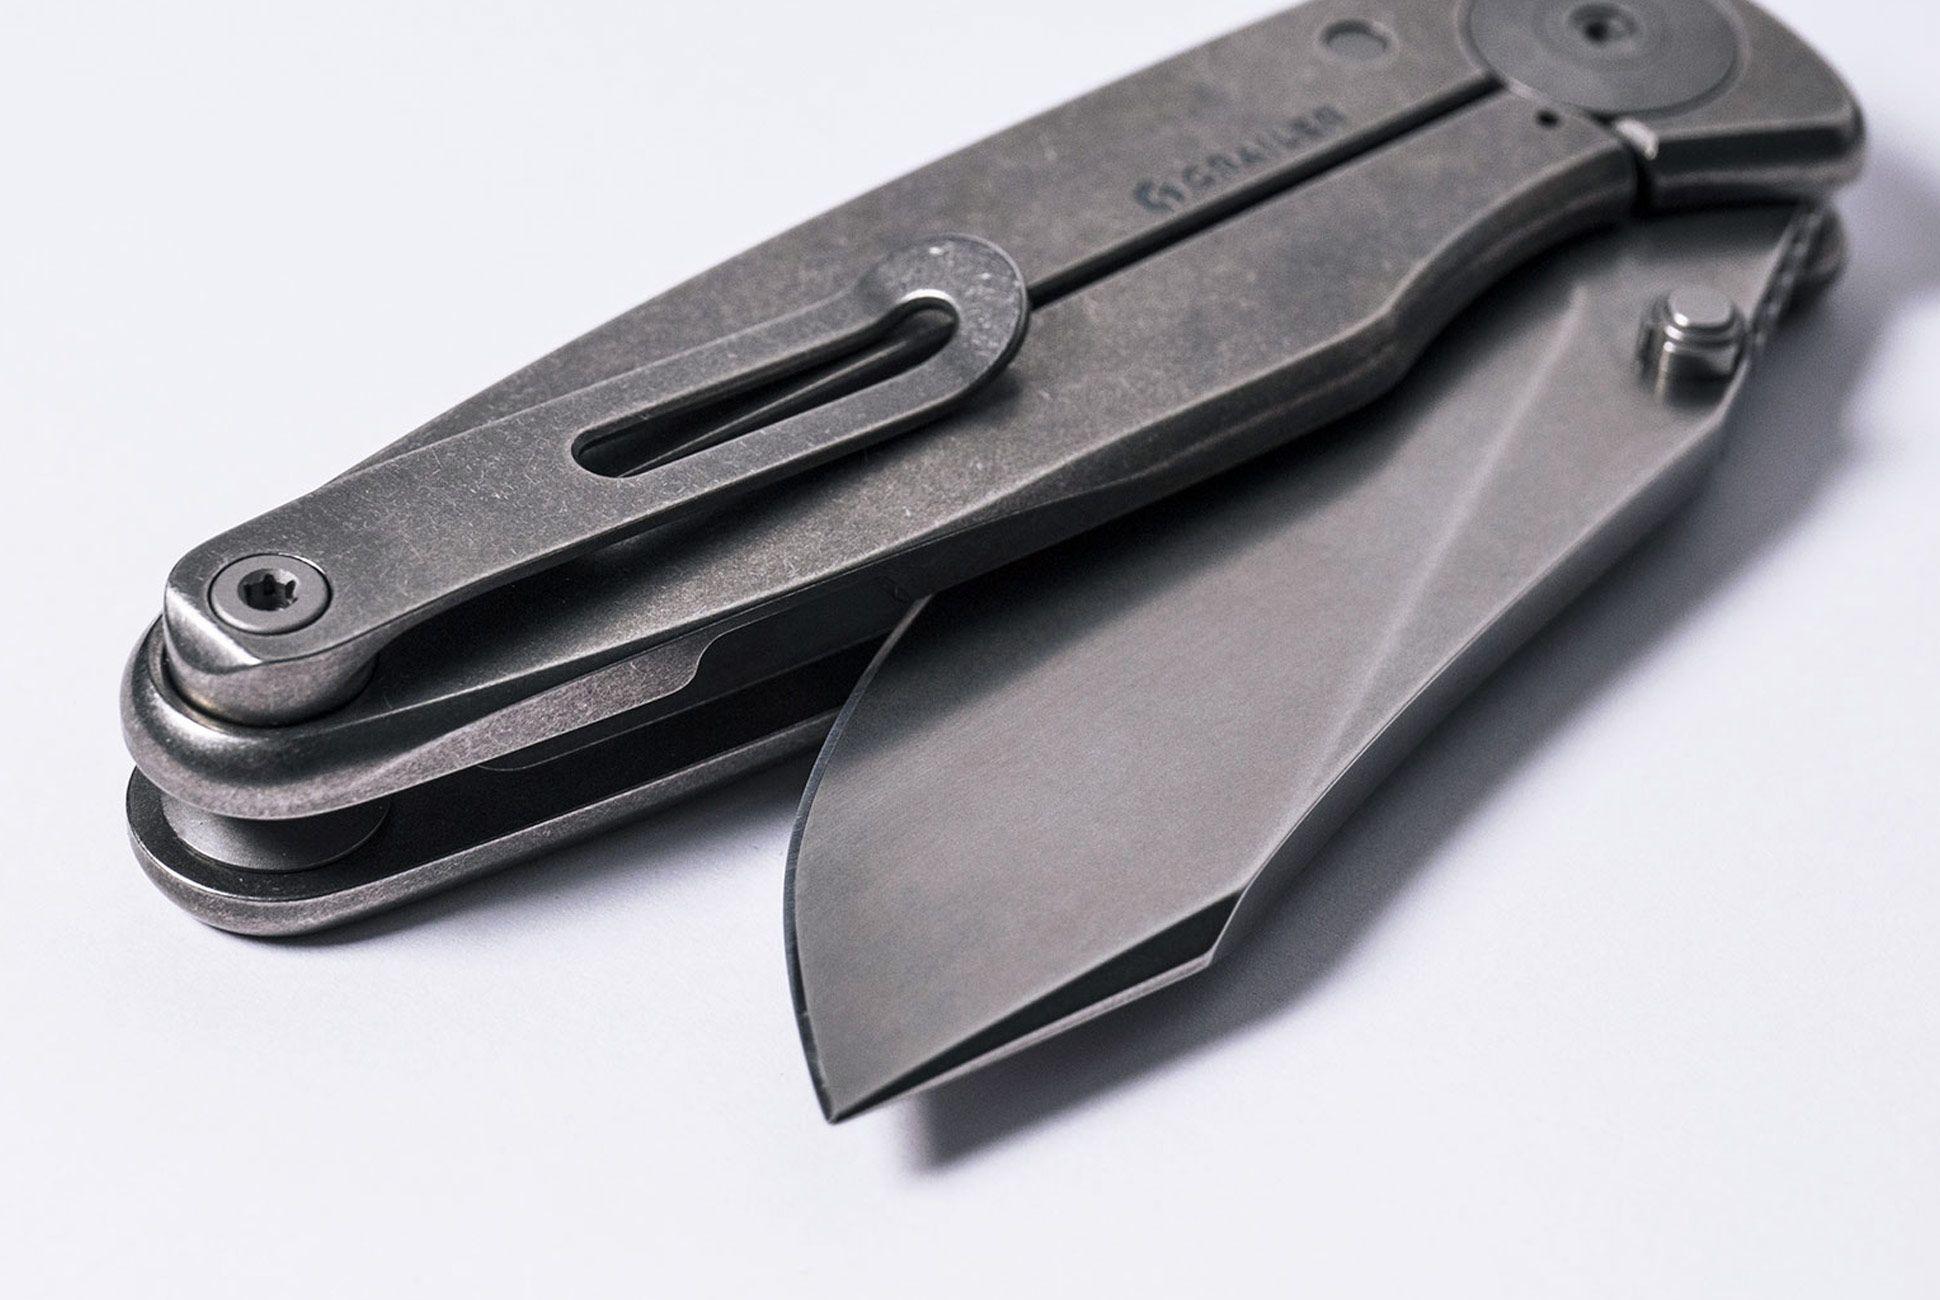 Grailer-1-Knife-gear-patrol-slide-3